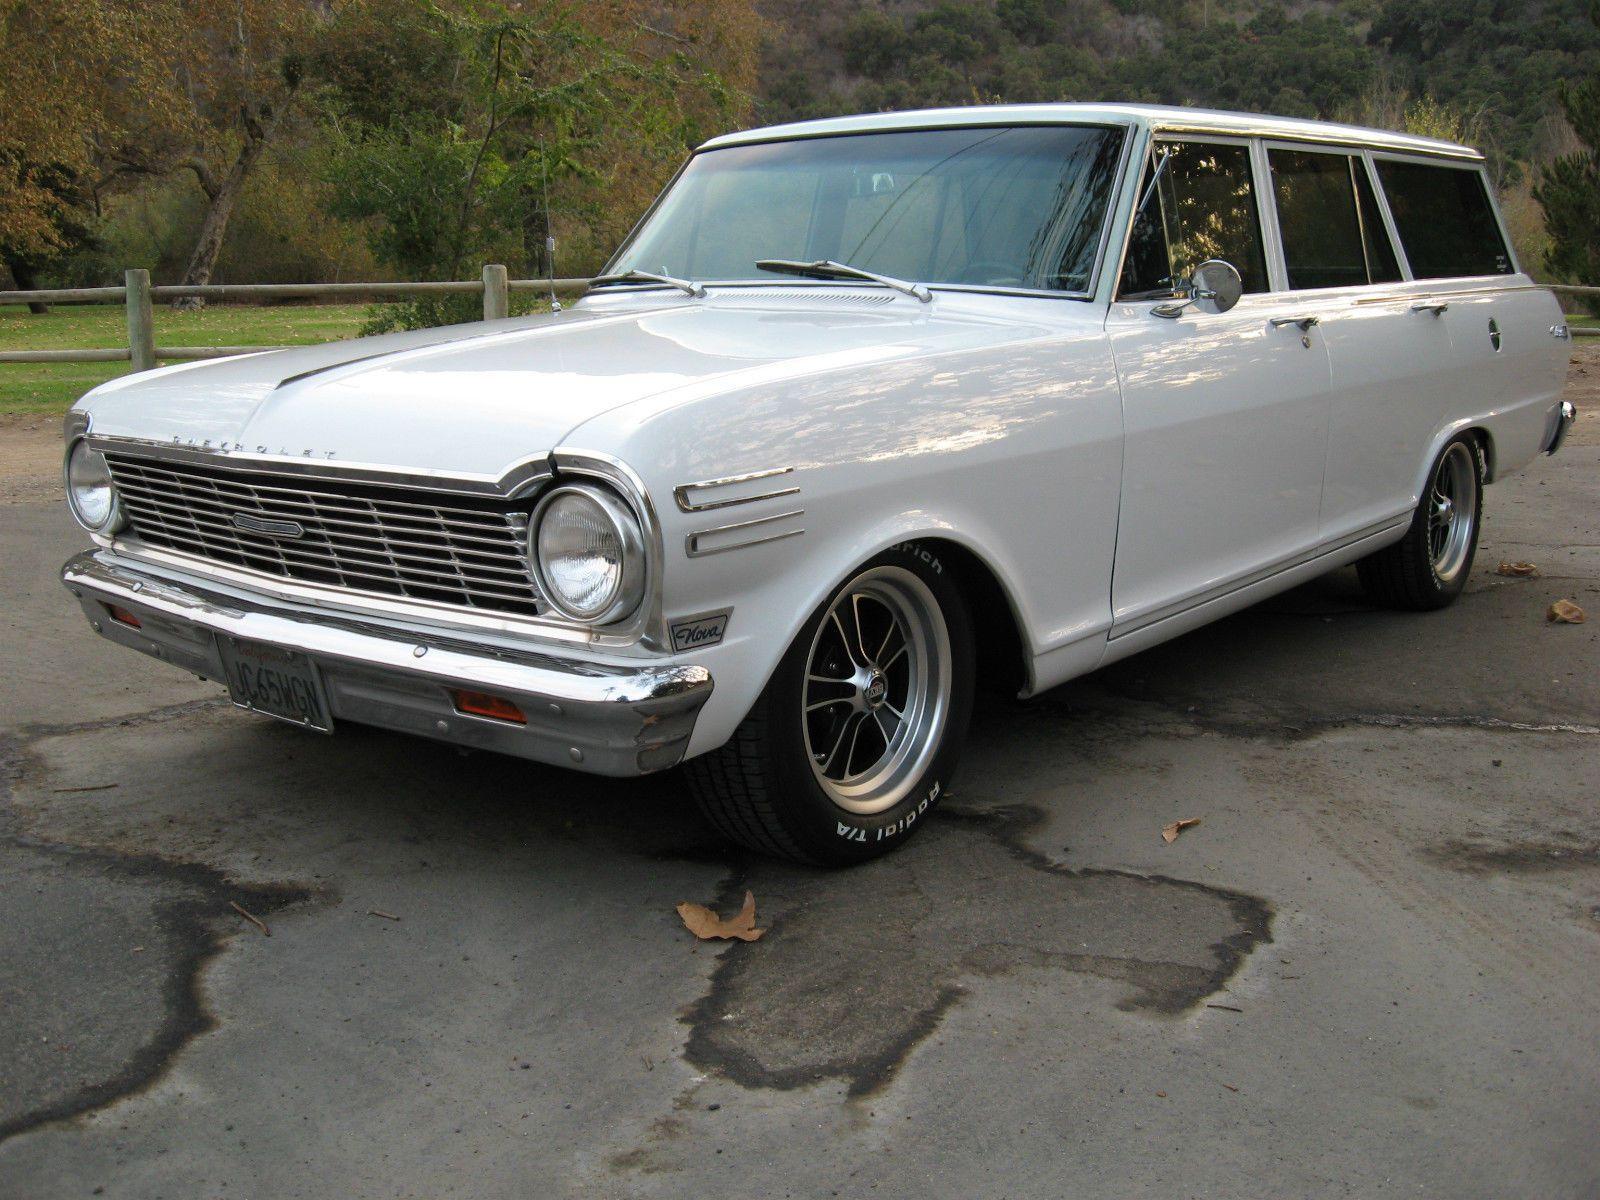 Chevrolet Nova Wagon Wagon Chevrolet Chevrolet Nova